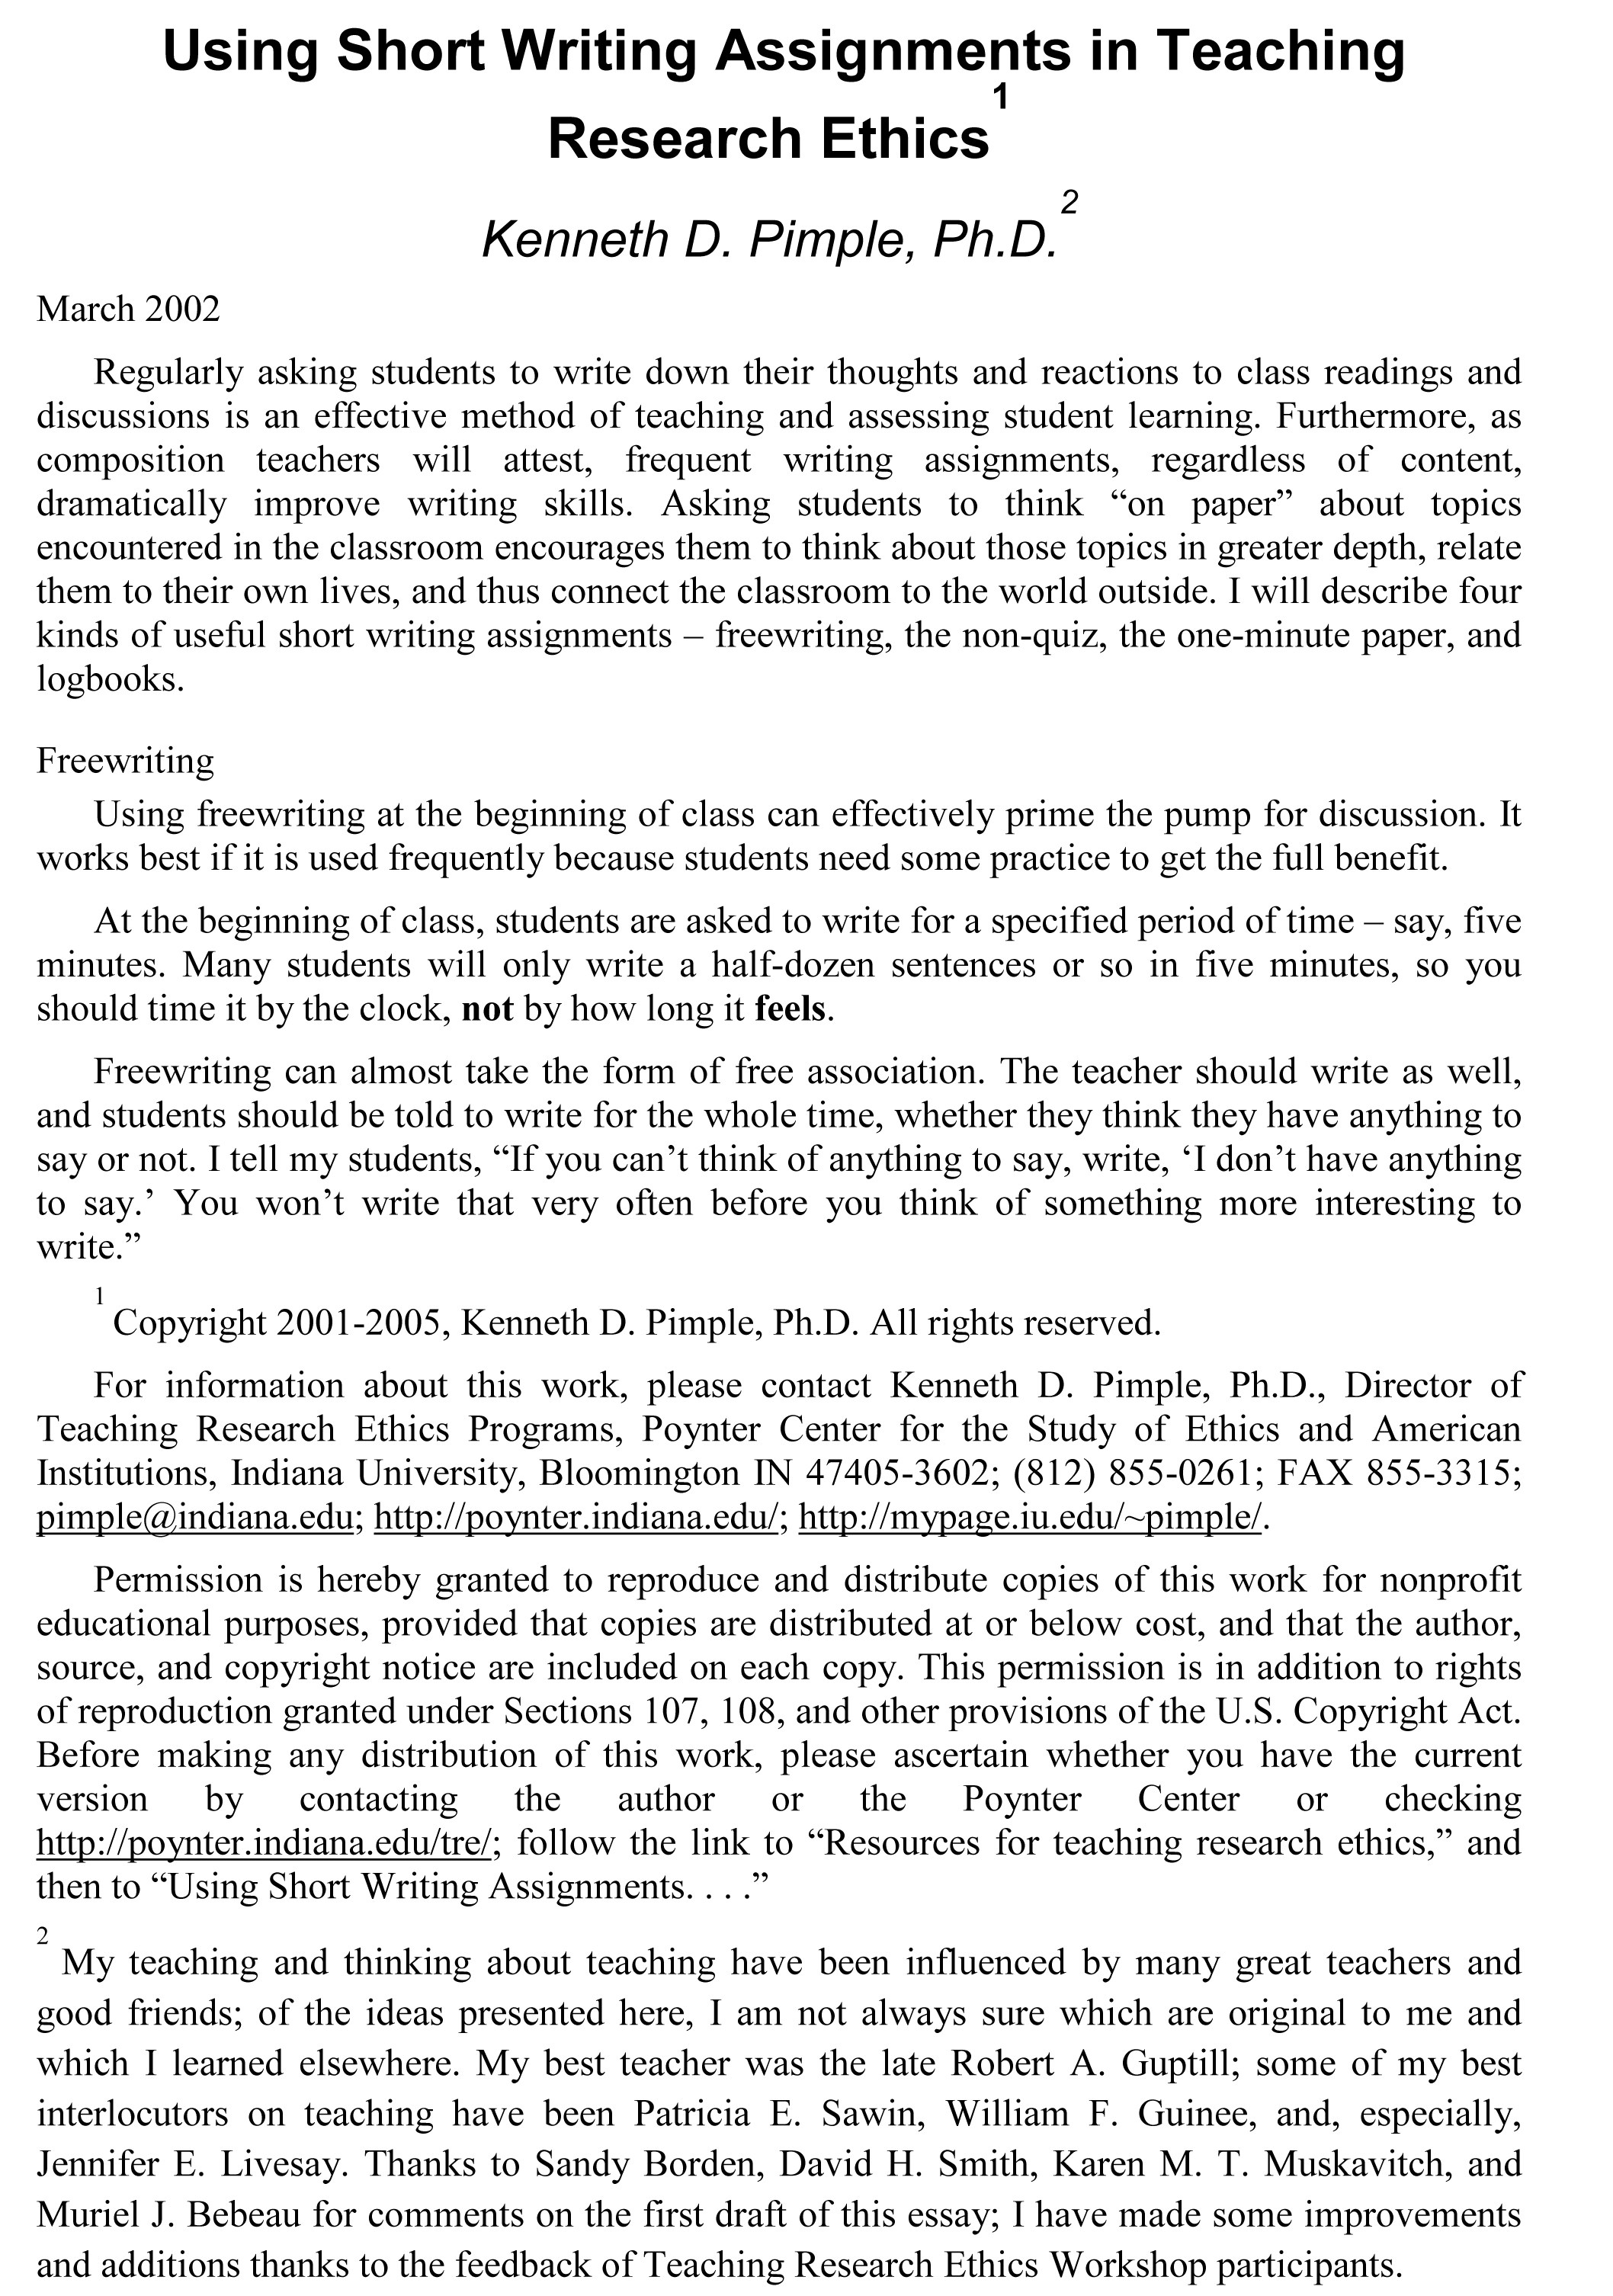 015 Essay Example Sample Teaching Evaluation Shocking Argument Full